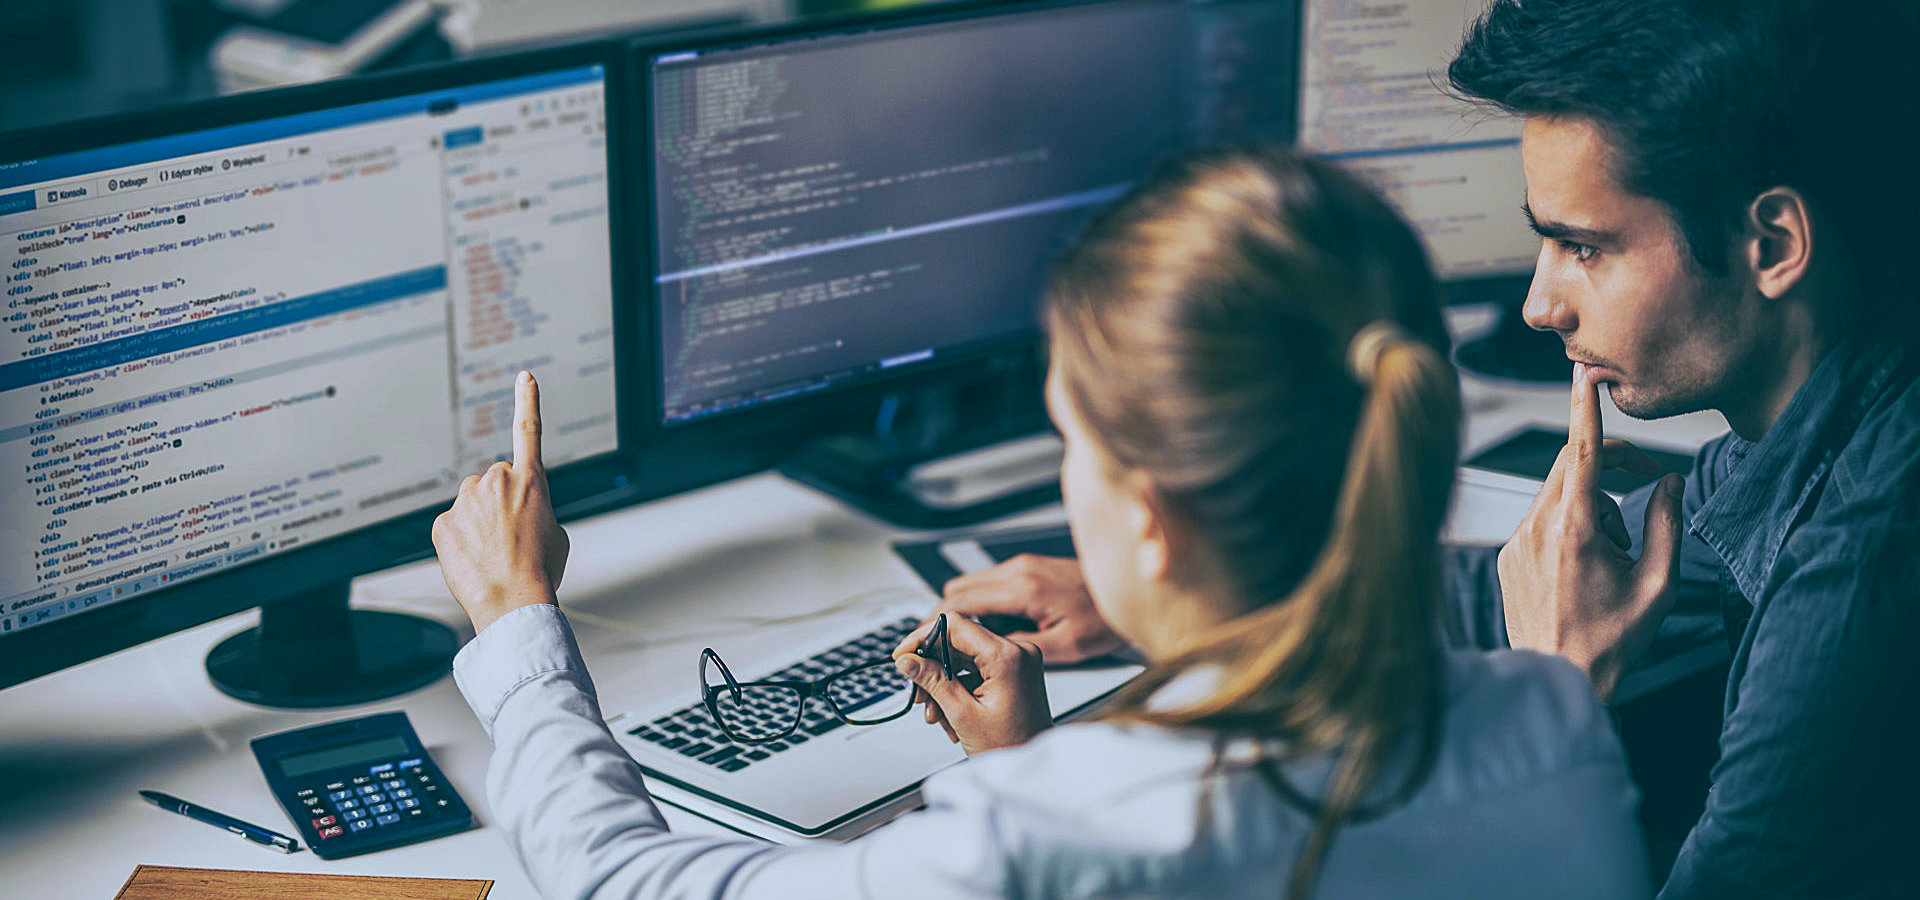 male developer assisting the female developer